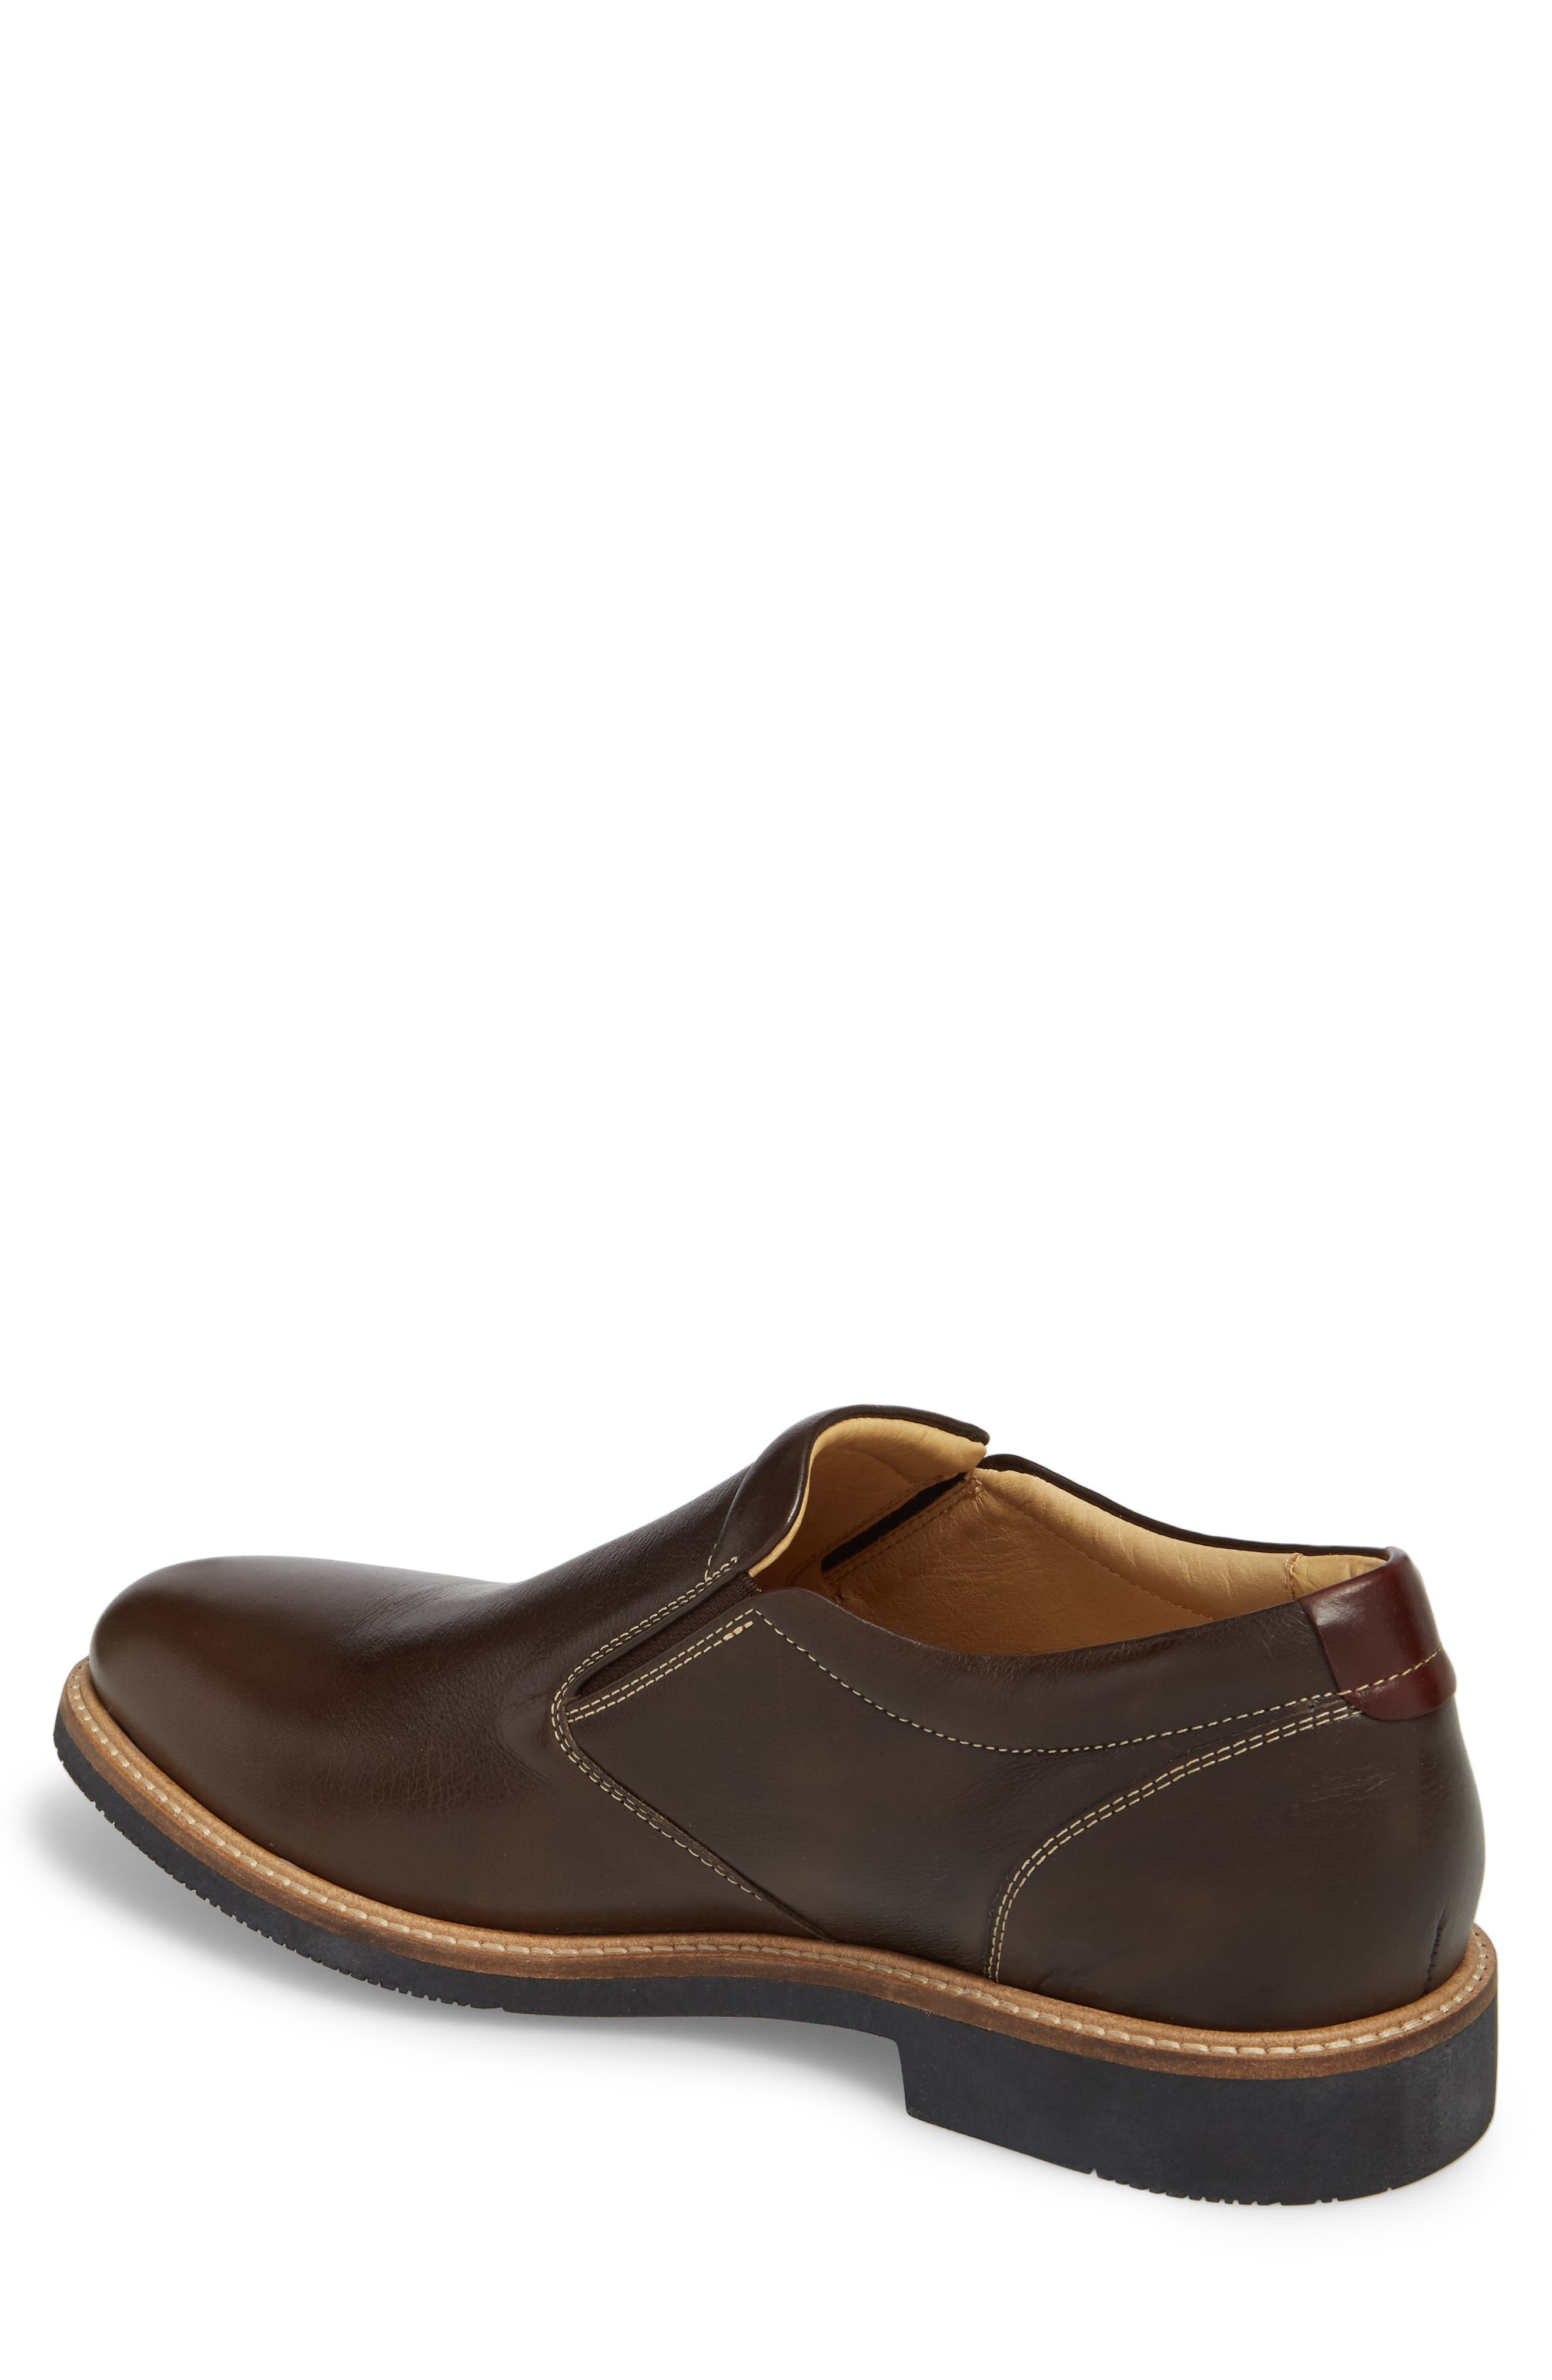 JOHNSTON & MURPHY,                             Barlow Plain Toe Slip-On,                             Alternate thumbnail 2, color,                             DARK BROWN LEATHER